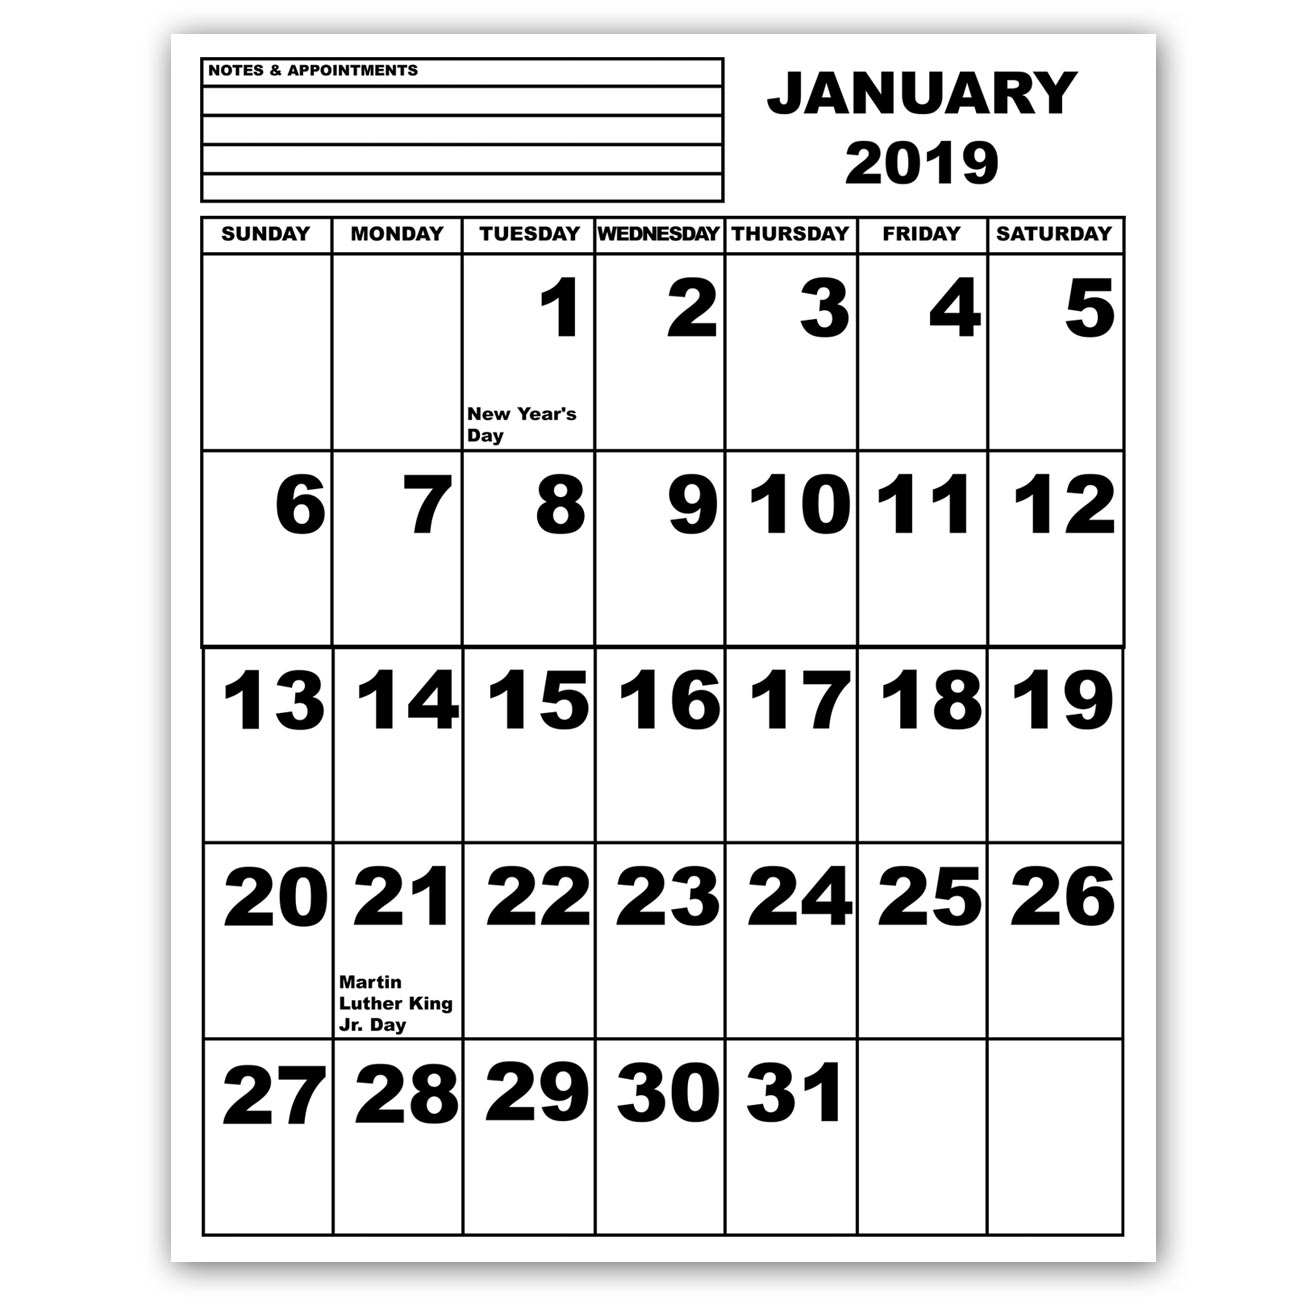 Jumbo Print Calendar - 2019